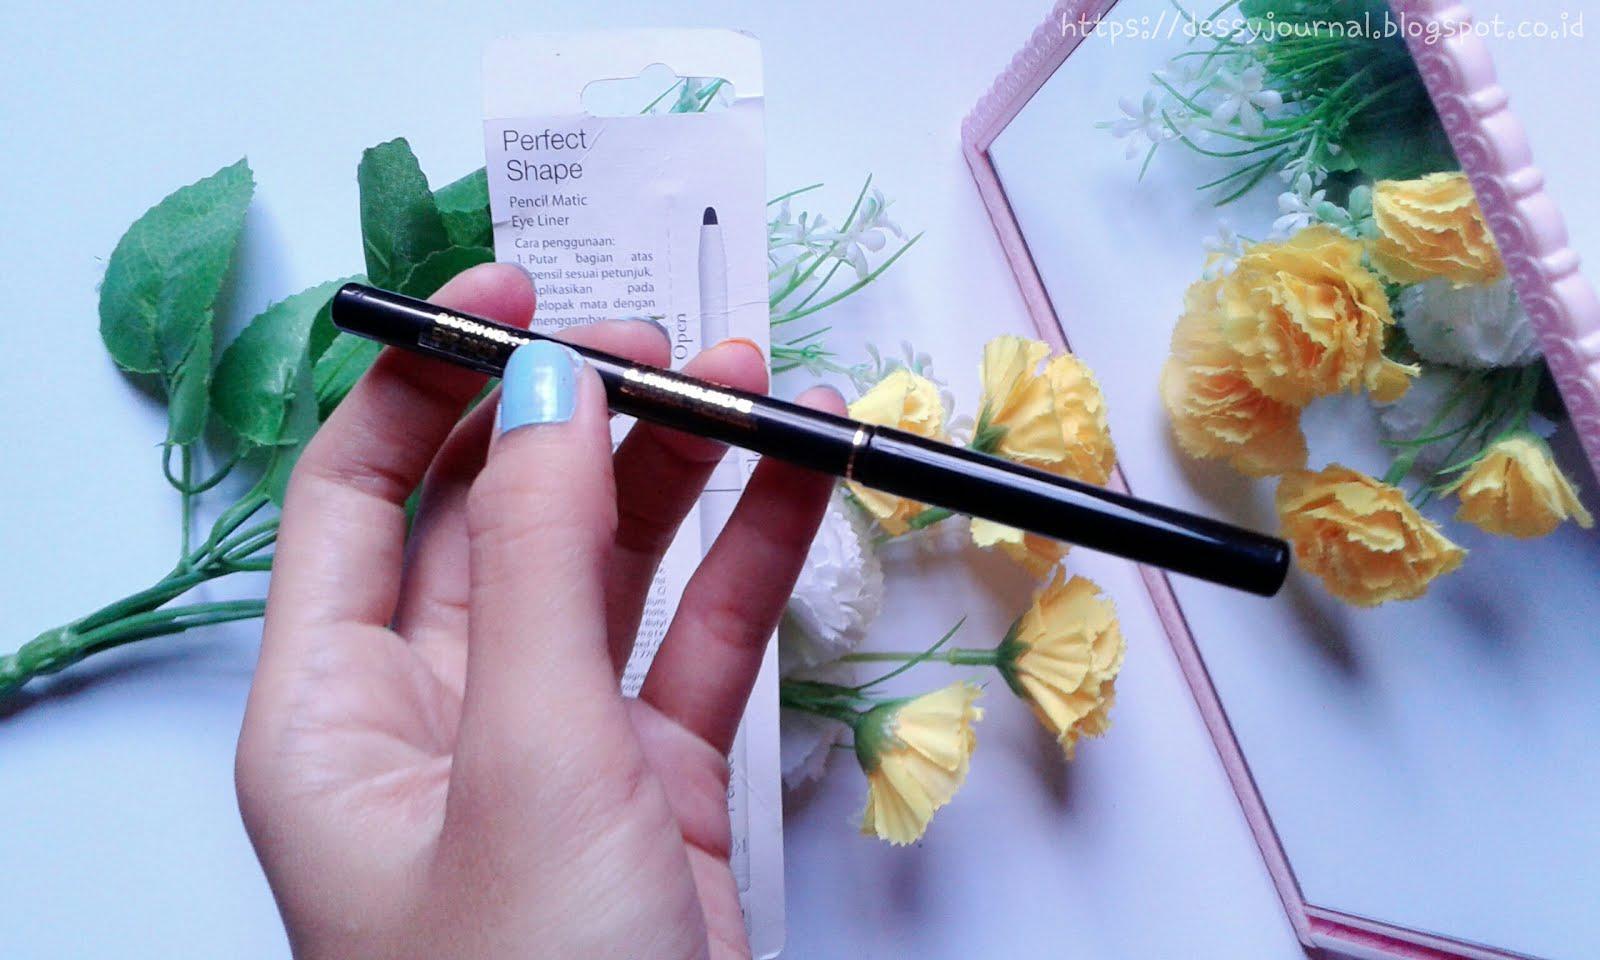 Viva Cosmetics Eyeliner Matic Biru 035 G Daftar Harga Terlengkap Queen Perfect Shape Pencil Eye Liner Ml Hitam Nya Sendiri Berbentul Pensil Yang Beraksen Kuning Emas Di Batang Ini